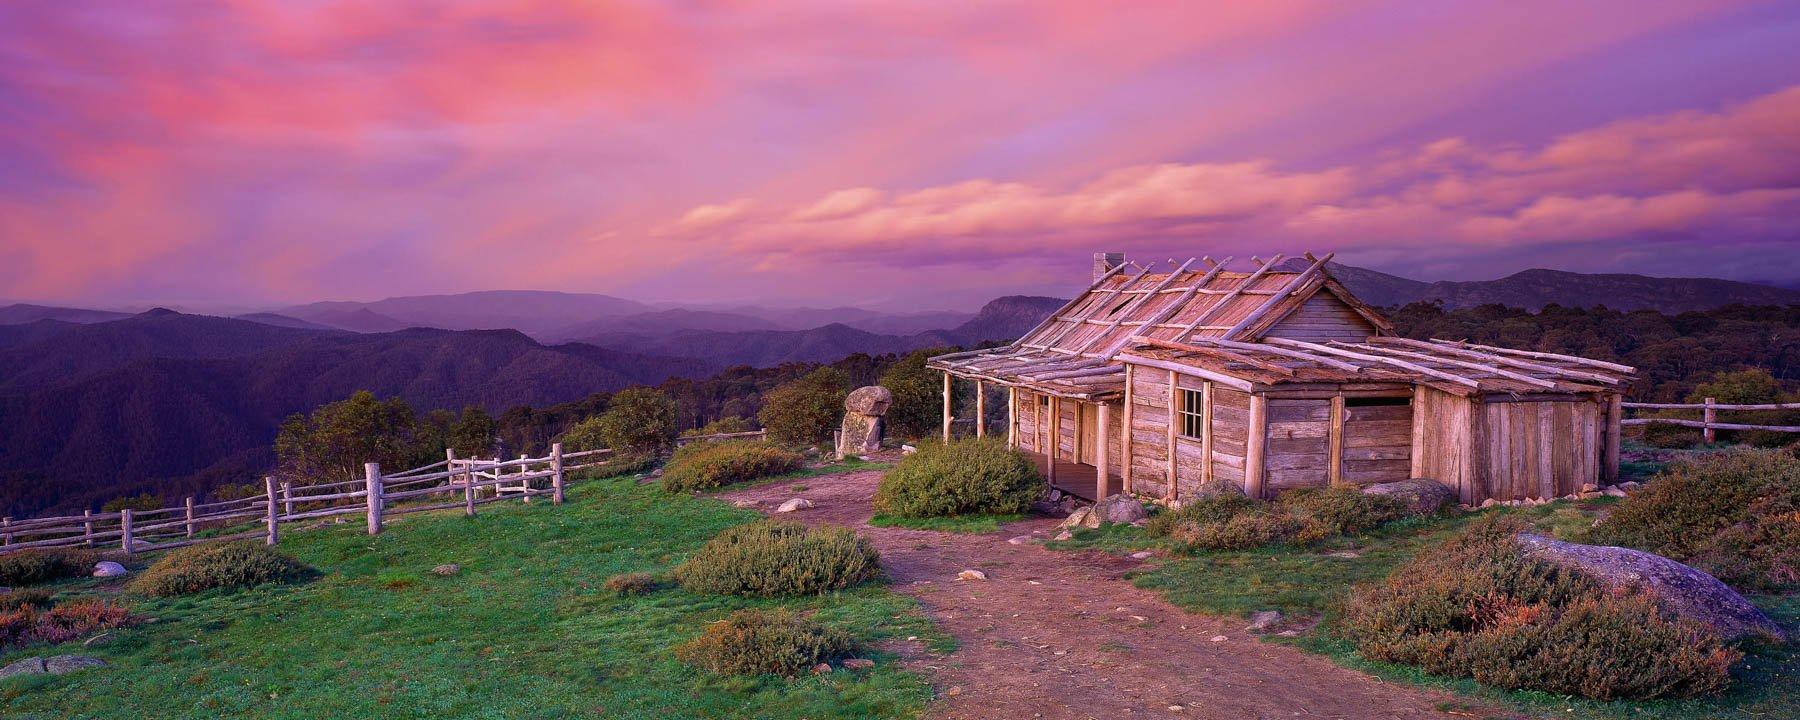 Dreams of Yesterday, Vic, Australia